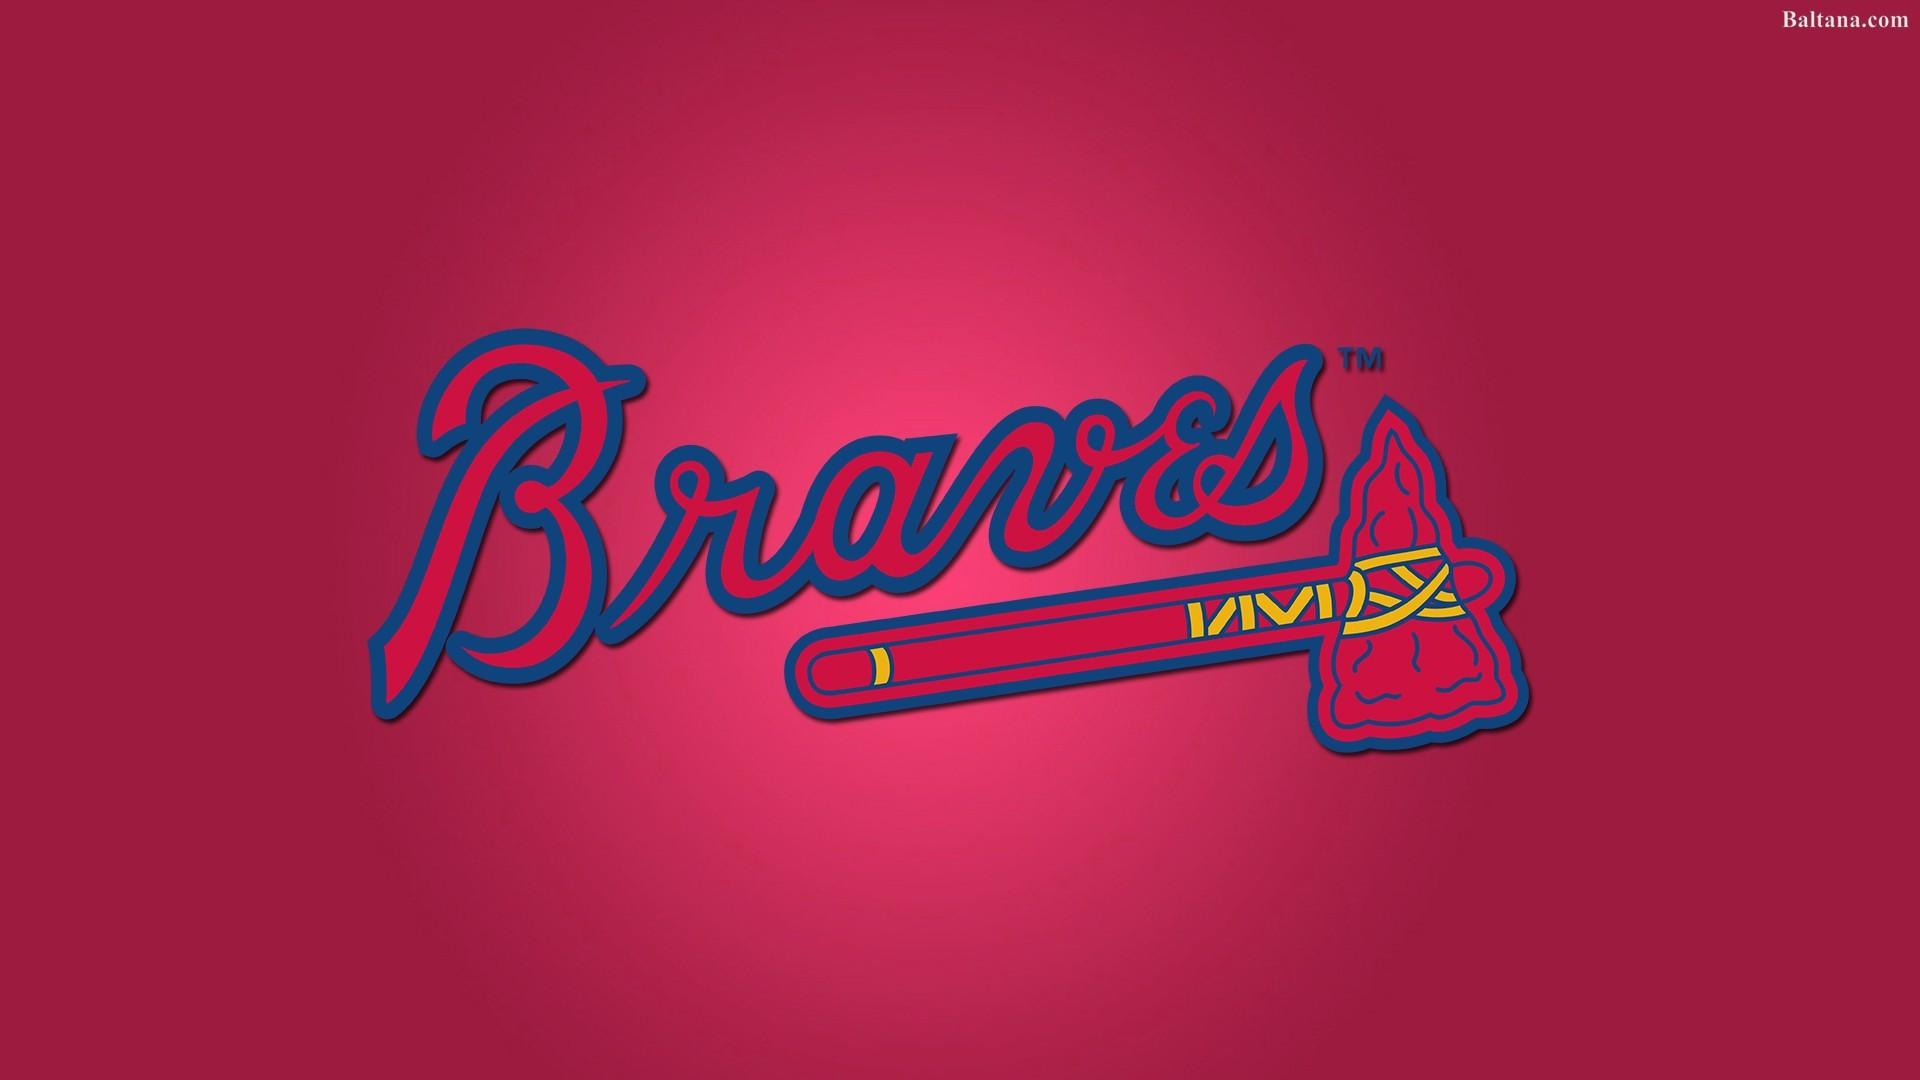 Atlanta Braves Logo Wallpaper 68 Images